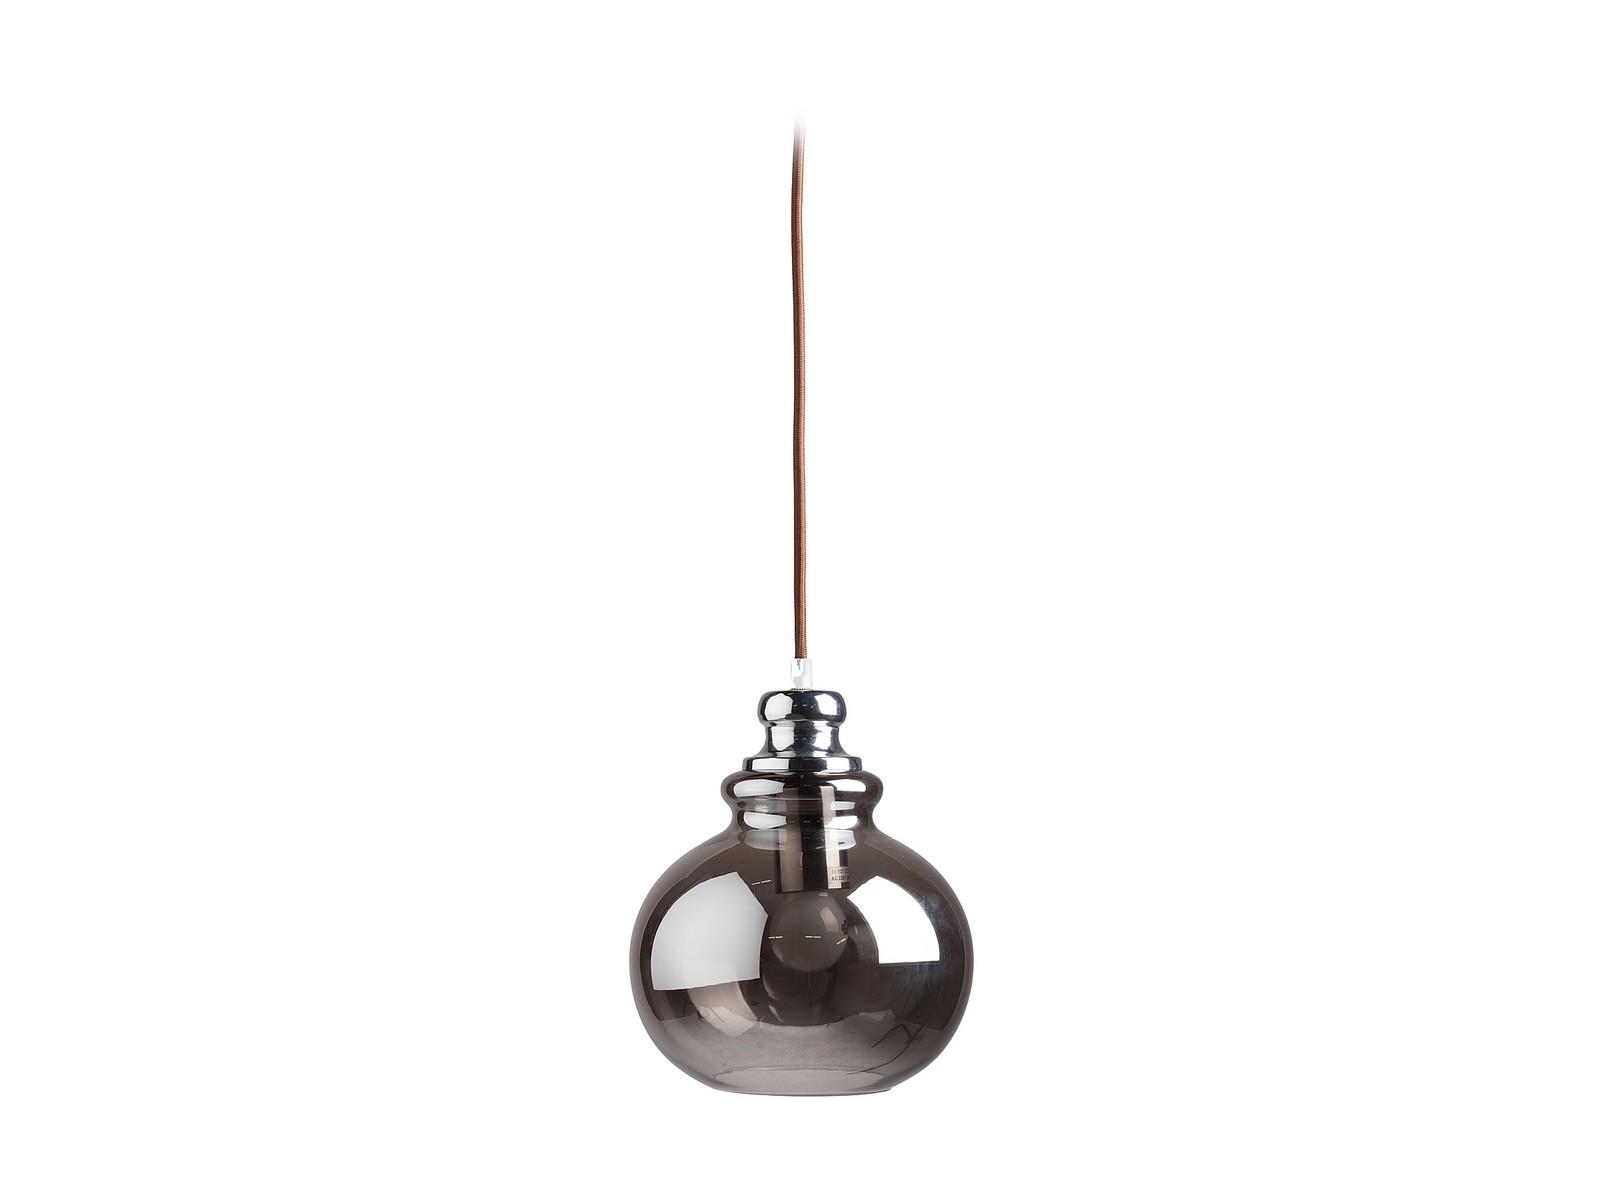 Подвесной светильник LotteПодвесные светильники<br>&amp;lt;div&amp;gt;Вид цоколя: Е27&amp;lt;/div&amp;gt;&amp;lt;div&amp;gt;Мощность лампы: 40W&amp;lt;/div&amp;gt;&amp;lt;div&amp;gt;Количество ламп: 1&amp;lt;/div&amp;gt;&amp;lt;div&amp;gt;Наличие ламп: нет&amp;lt;/div&amp;gt;<br><br>Material: Стекло<br>Height см: 23<br>Diameter см: 20